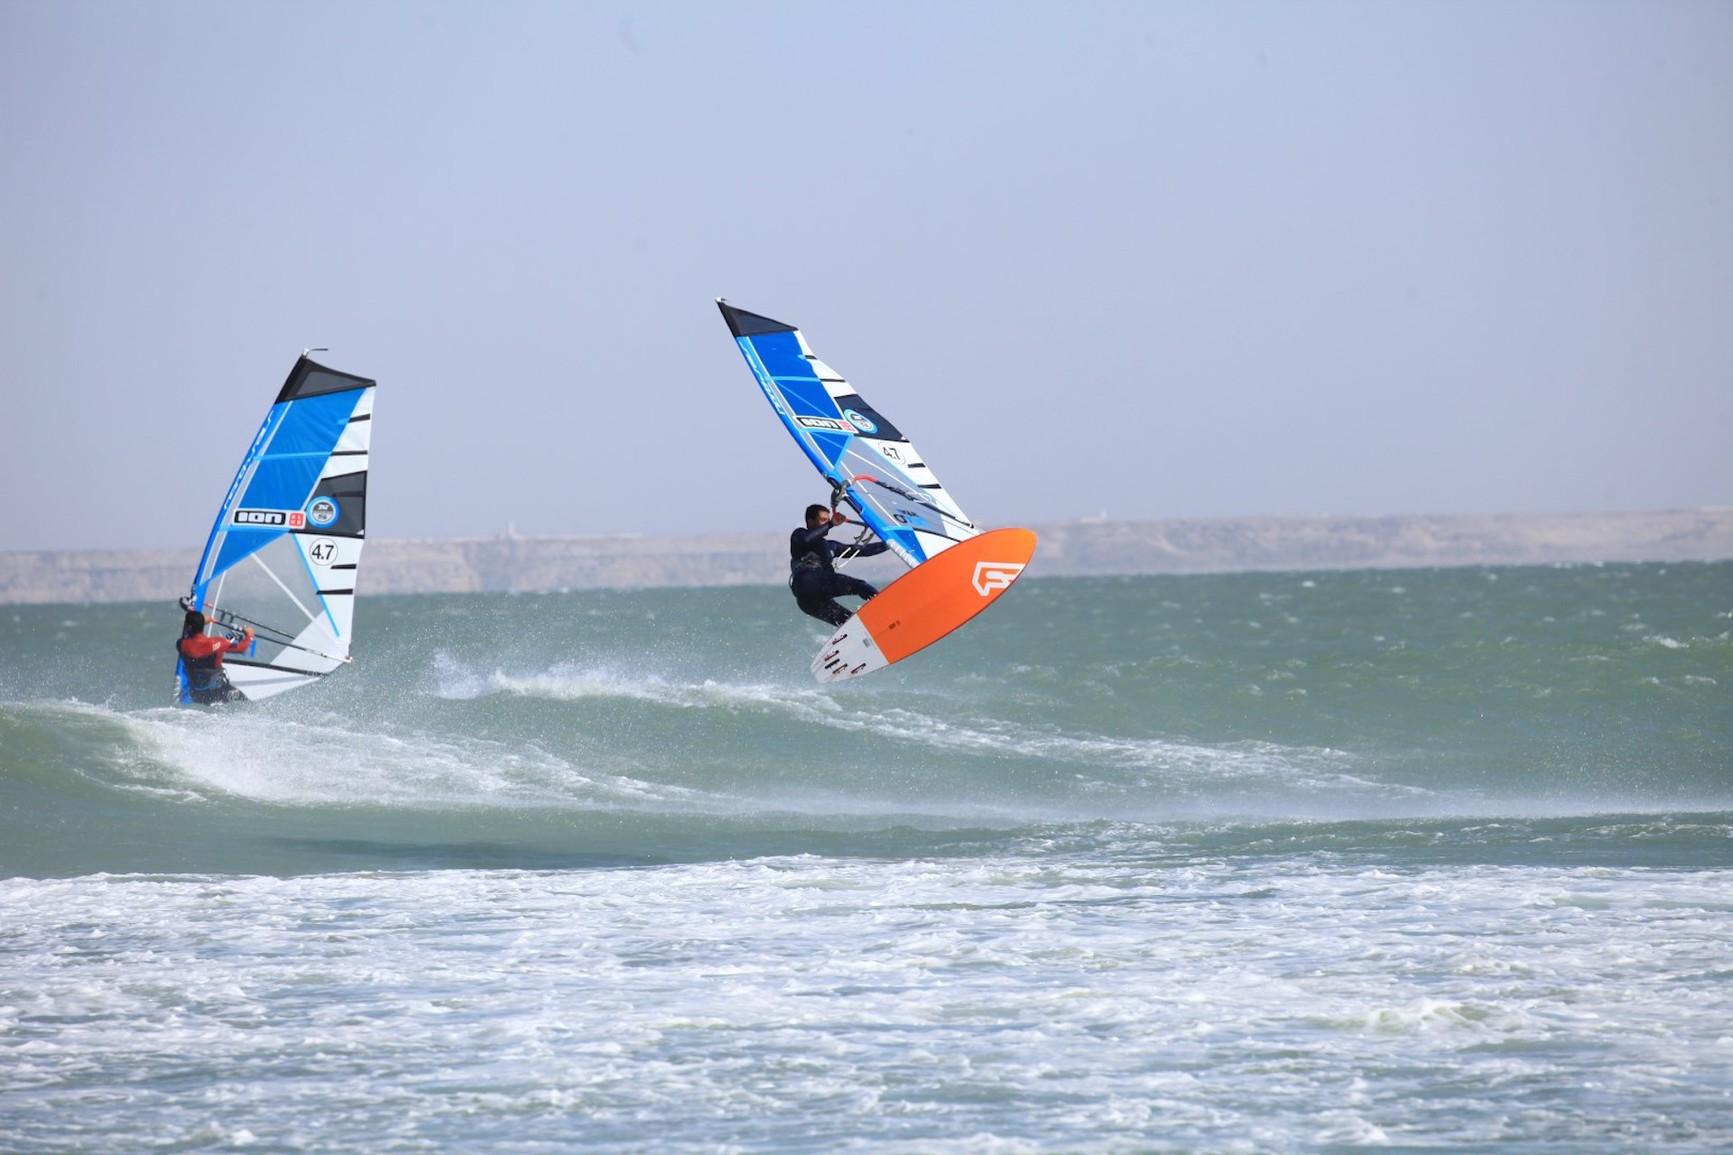 Windsurf Board Storage In Lassarga Marocco Ion Club